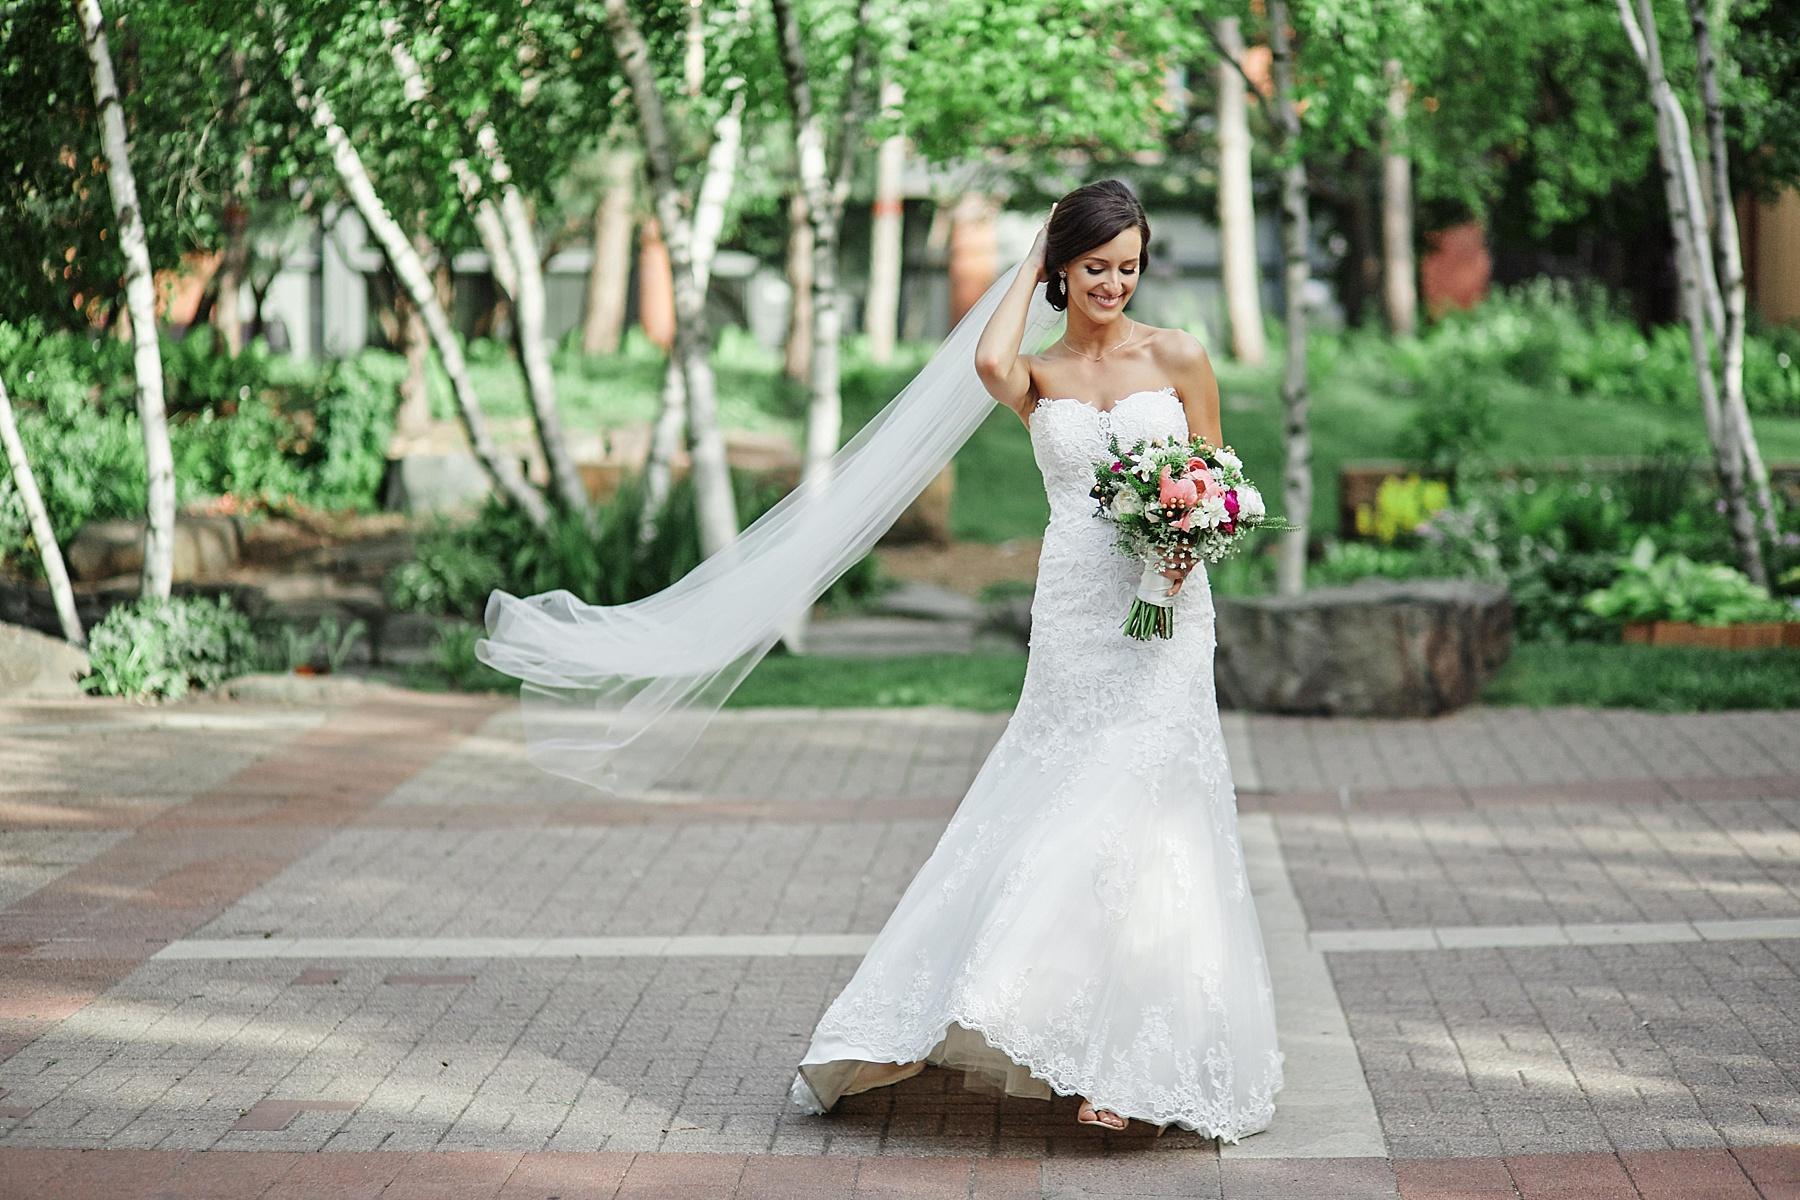 ABULAE-Wedding-Saint-paul-MN-Josh-Sofia-Wedding-Mears-Park_0796.jpg